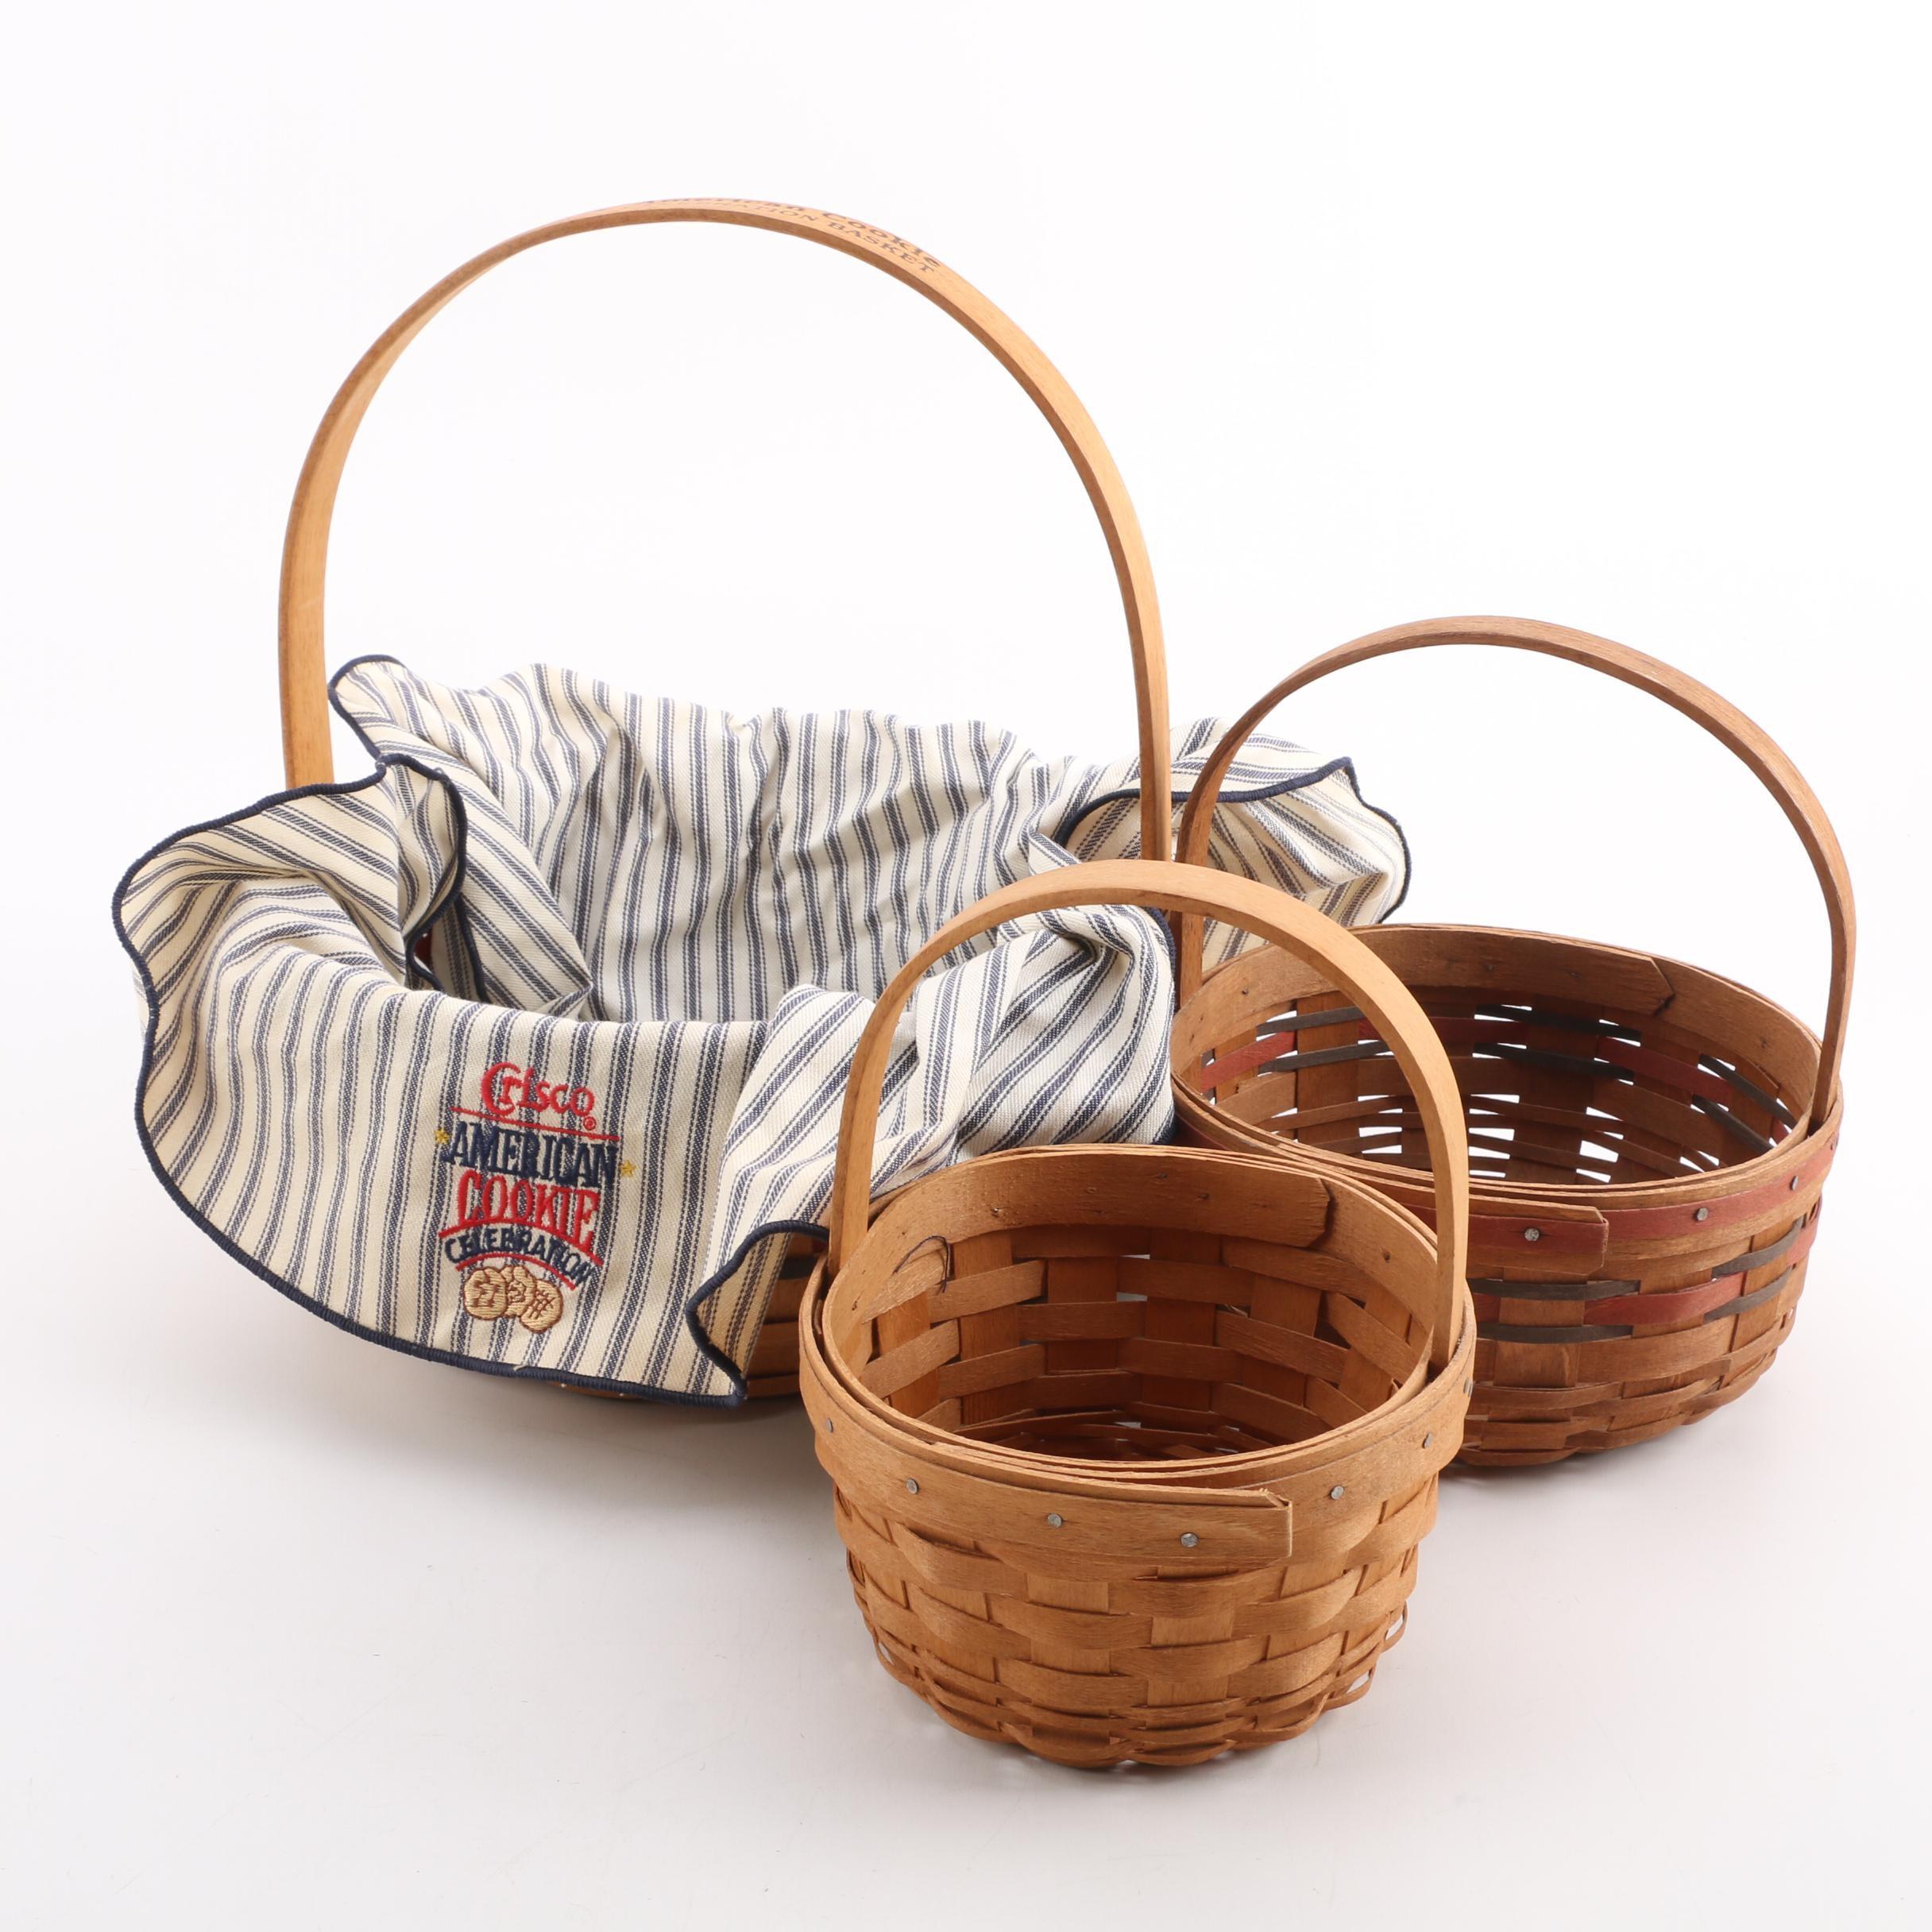 "Woven Baskets featuring Longaberger Crisco ""American Cookie Celebration"" Basket"